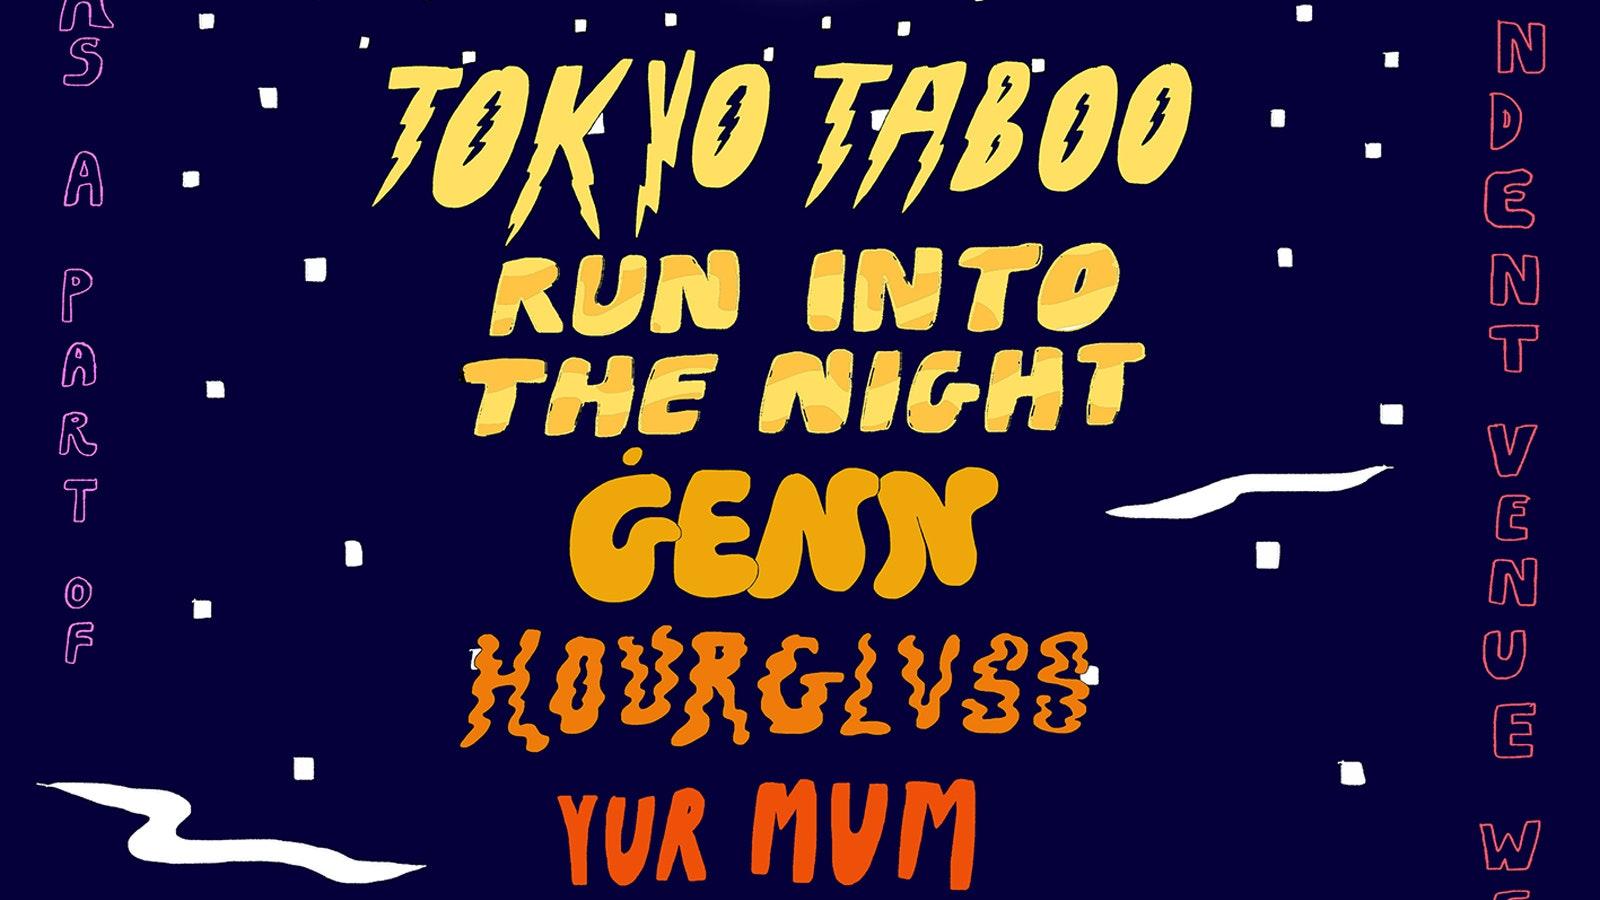 Tokyo Taboo + Ġenn + Run Into The Night + Hourglvss + Yur Mum